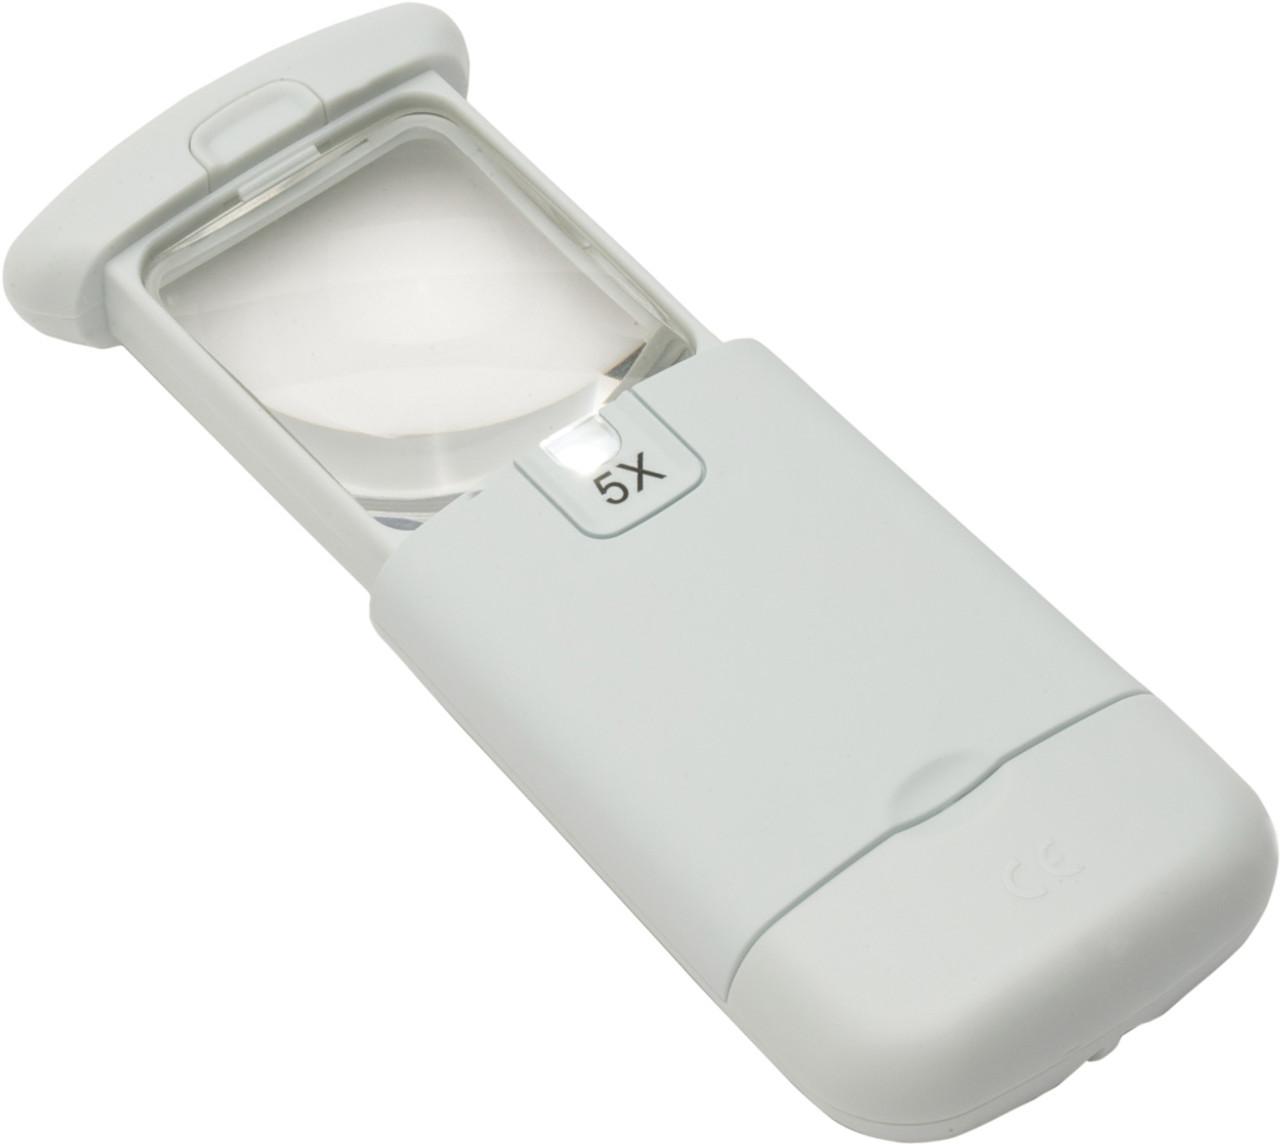 Slide Magnifier 5x/16D